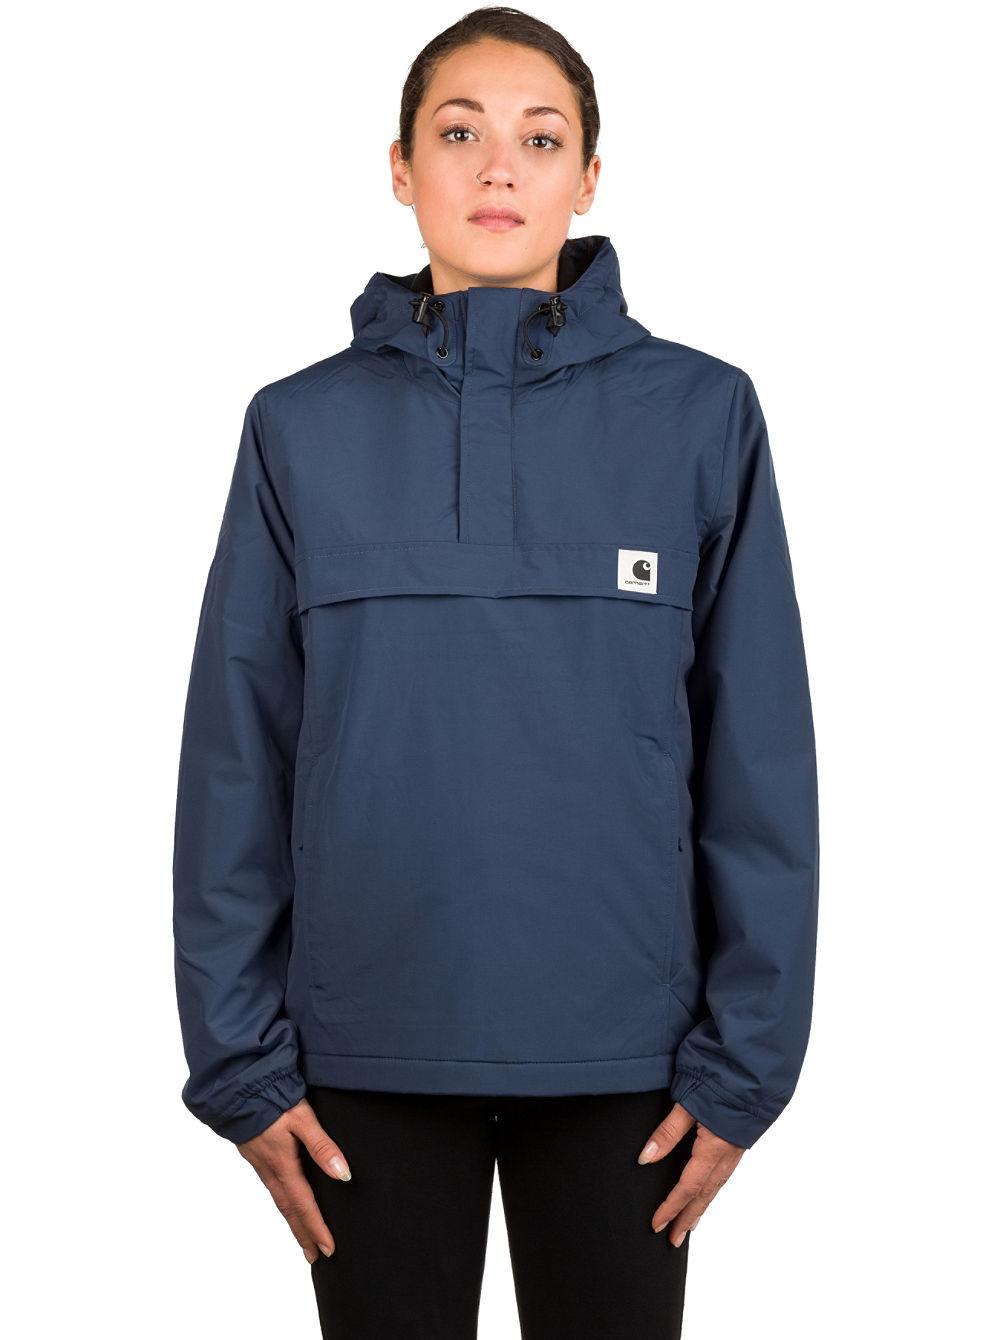 Where can i buy a carhartt jacket